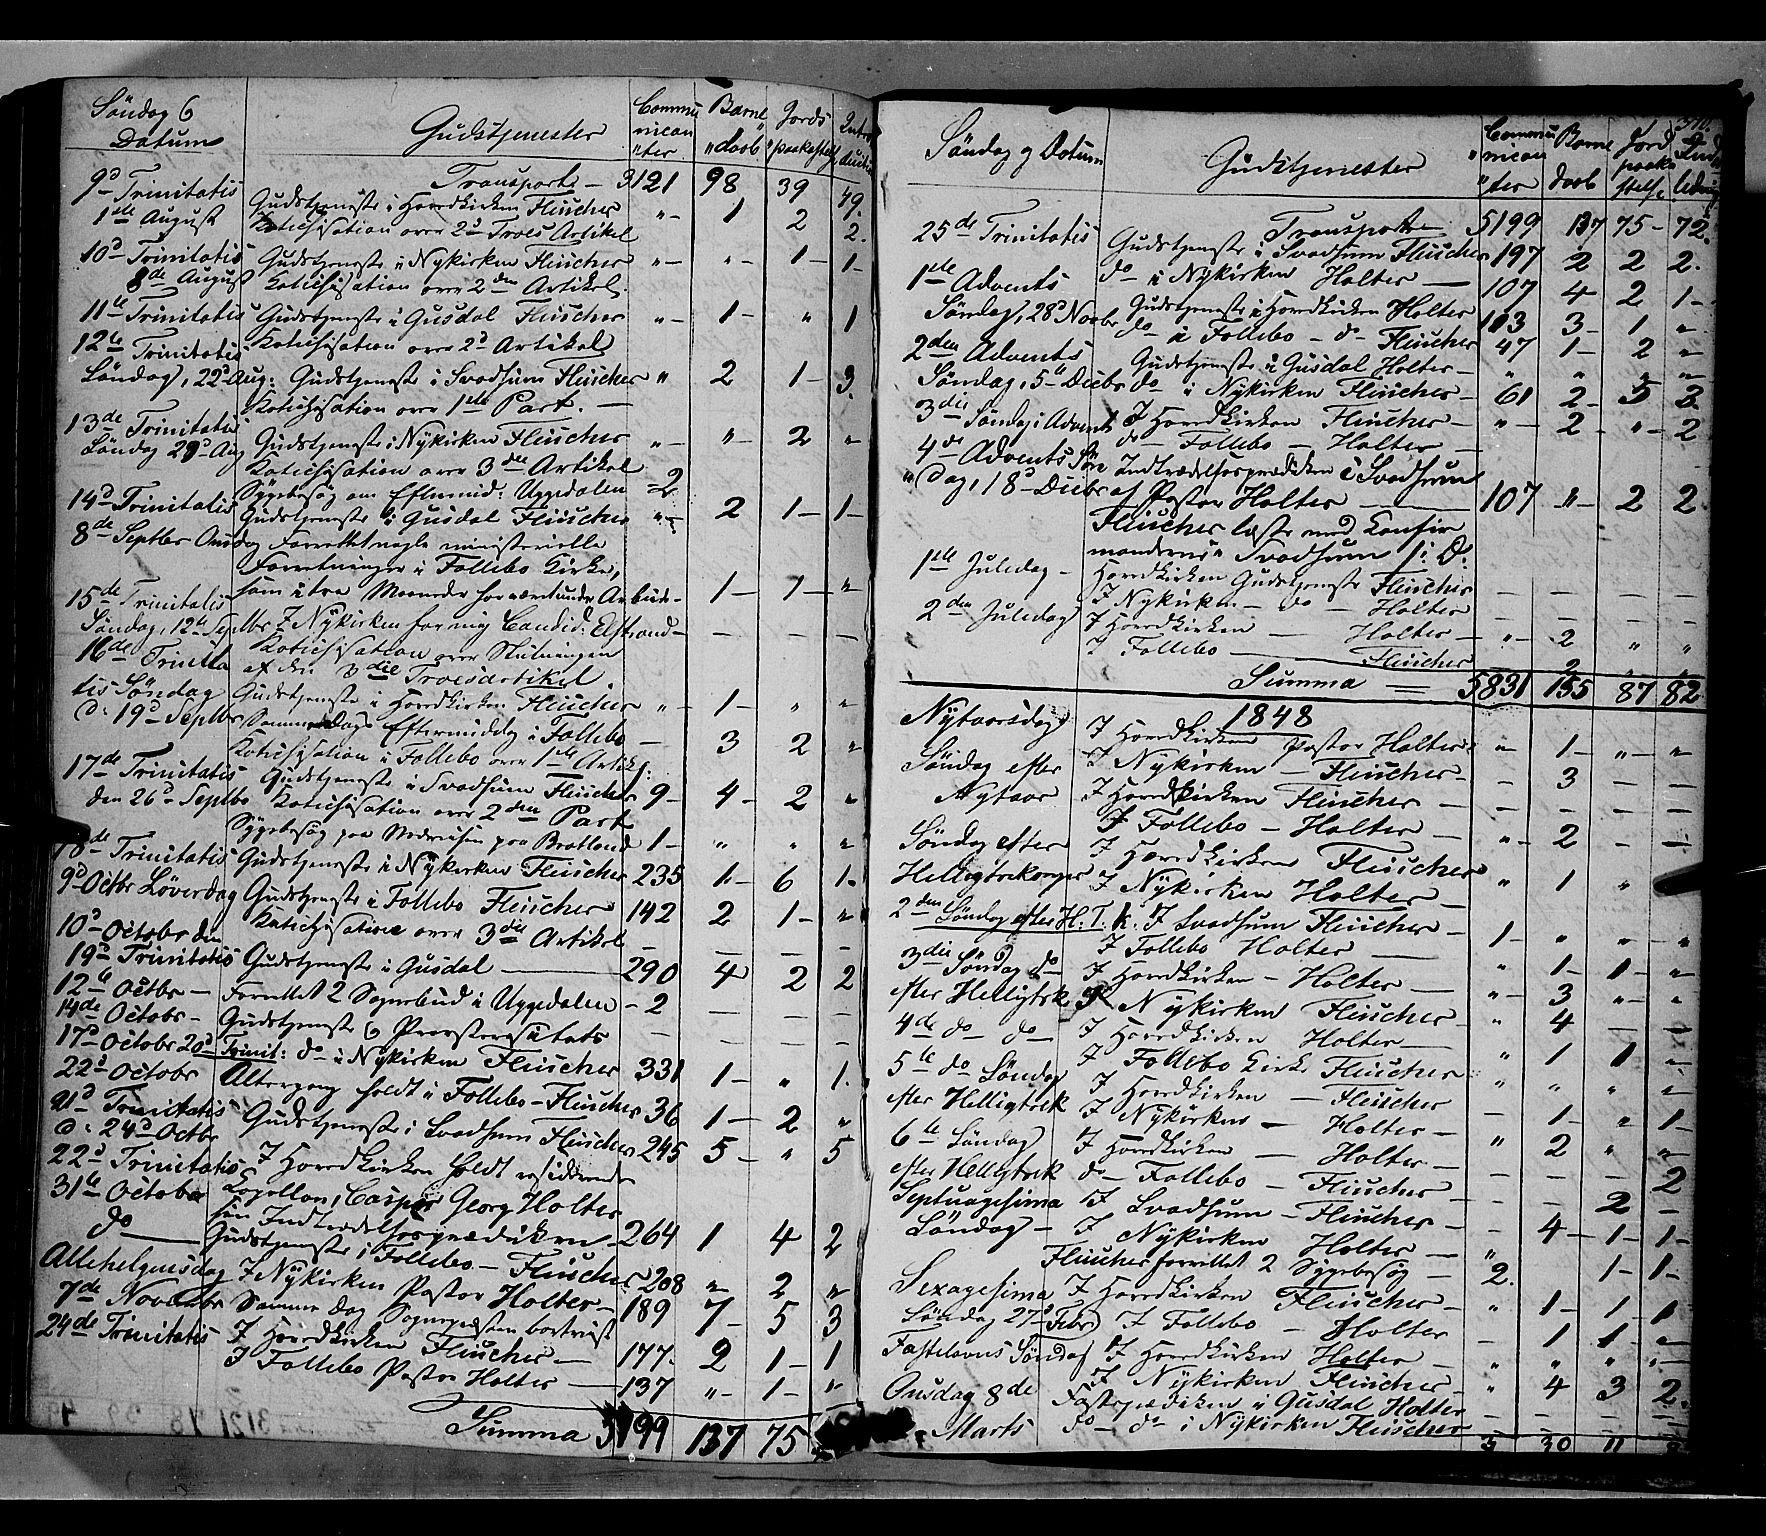 SAH, Gausdal prestekontor, Ministerialbok nr. 7, 1840-1850, s. 370